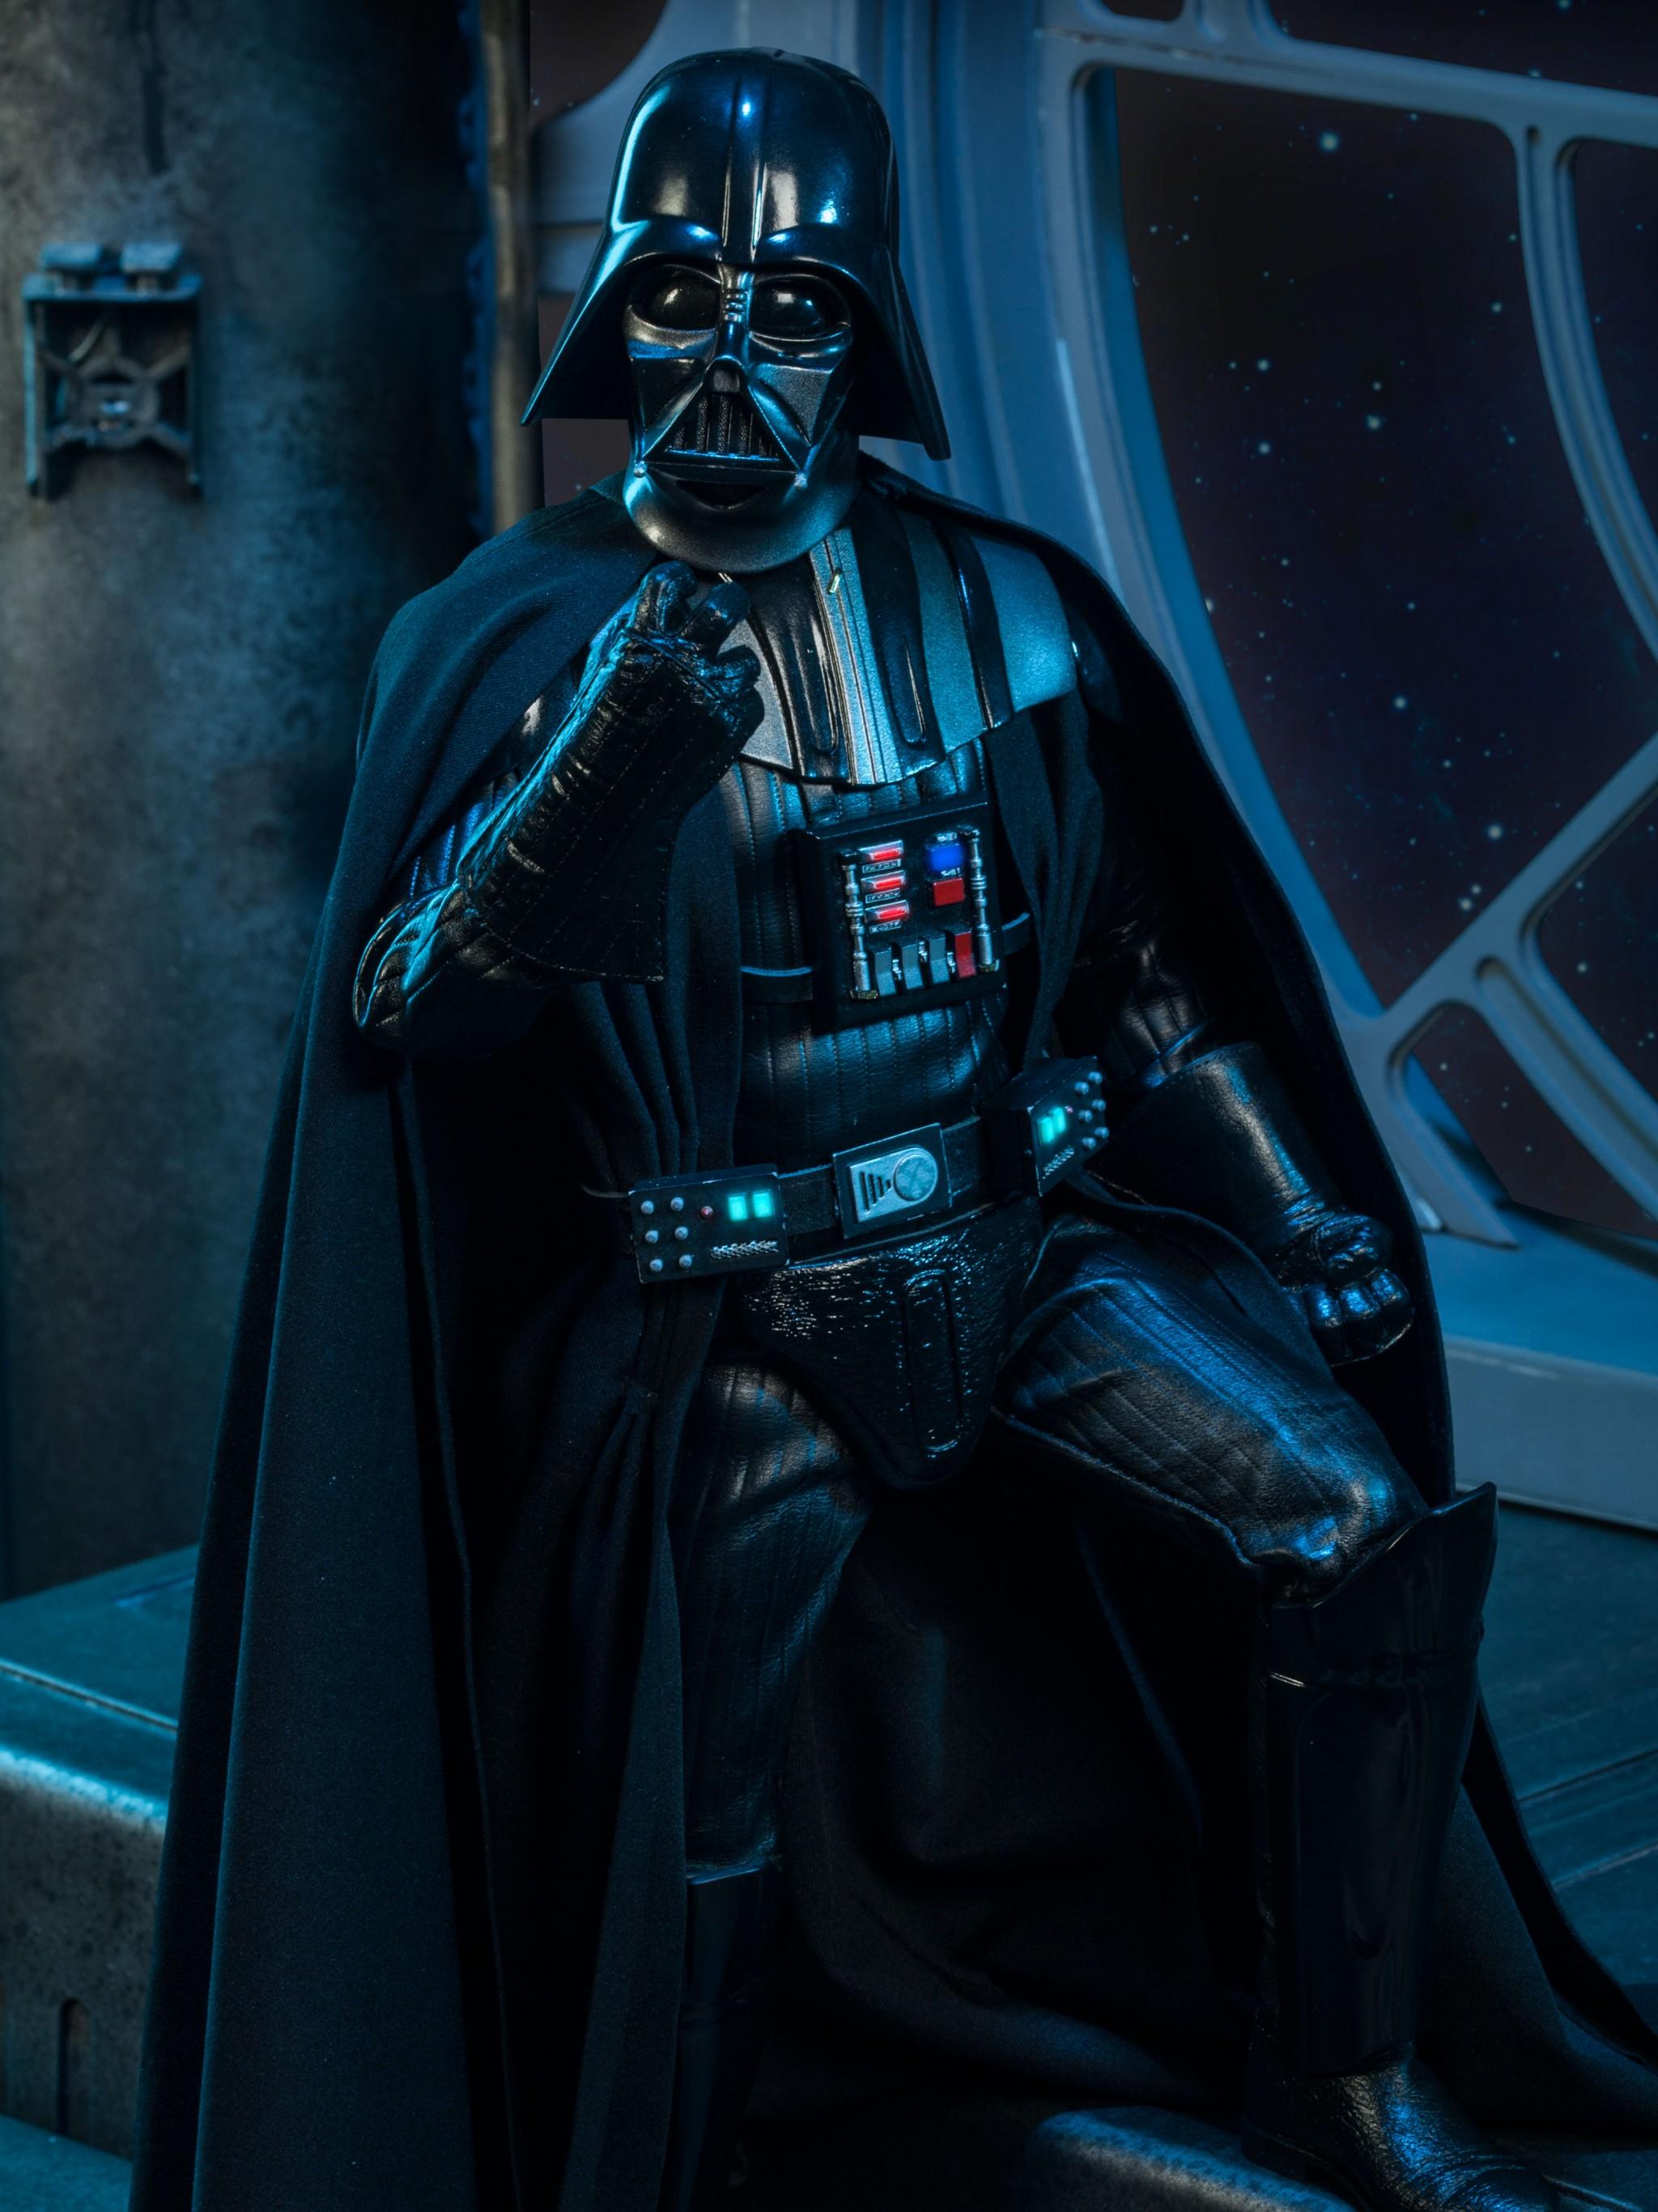 Star Wars Darth Vader Wallpaper 4k The Best Hd Wallpaper 2048x2732 Download Hd Wallpaper Wallpapertip